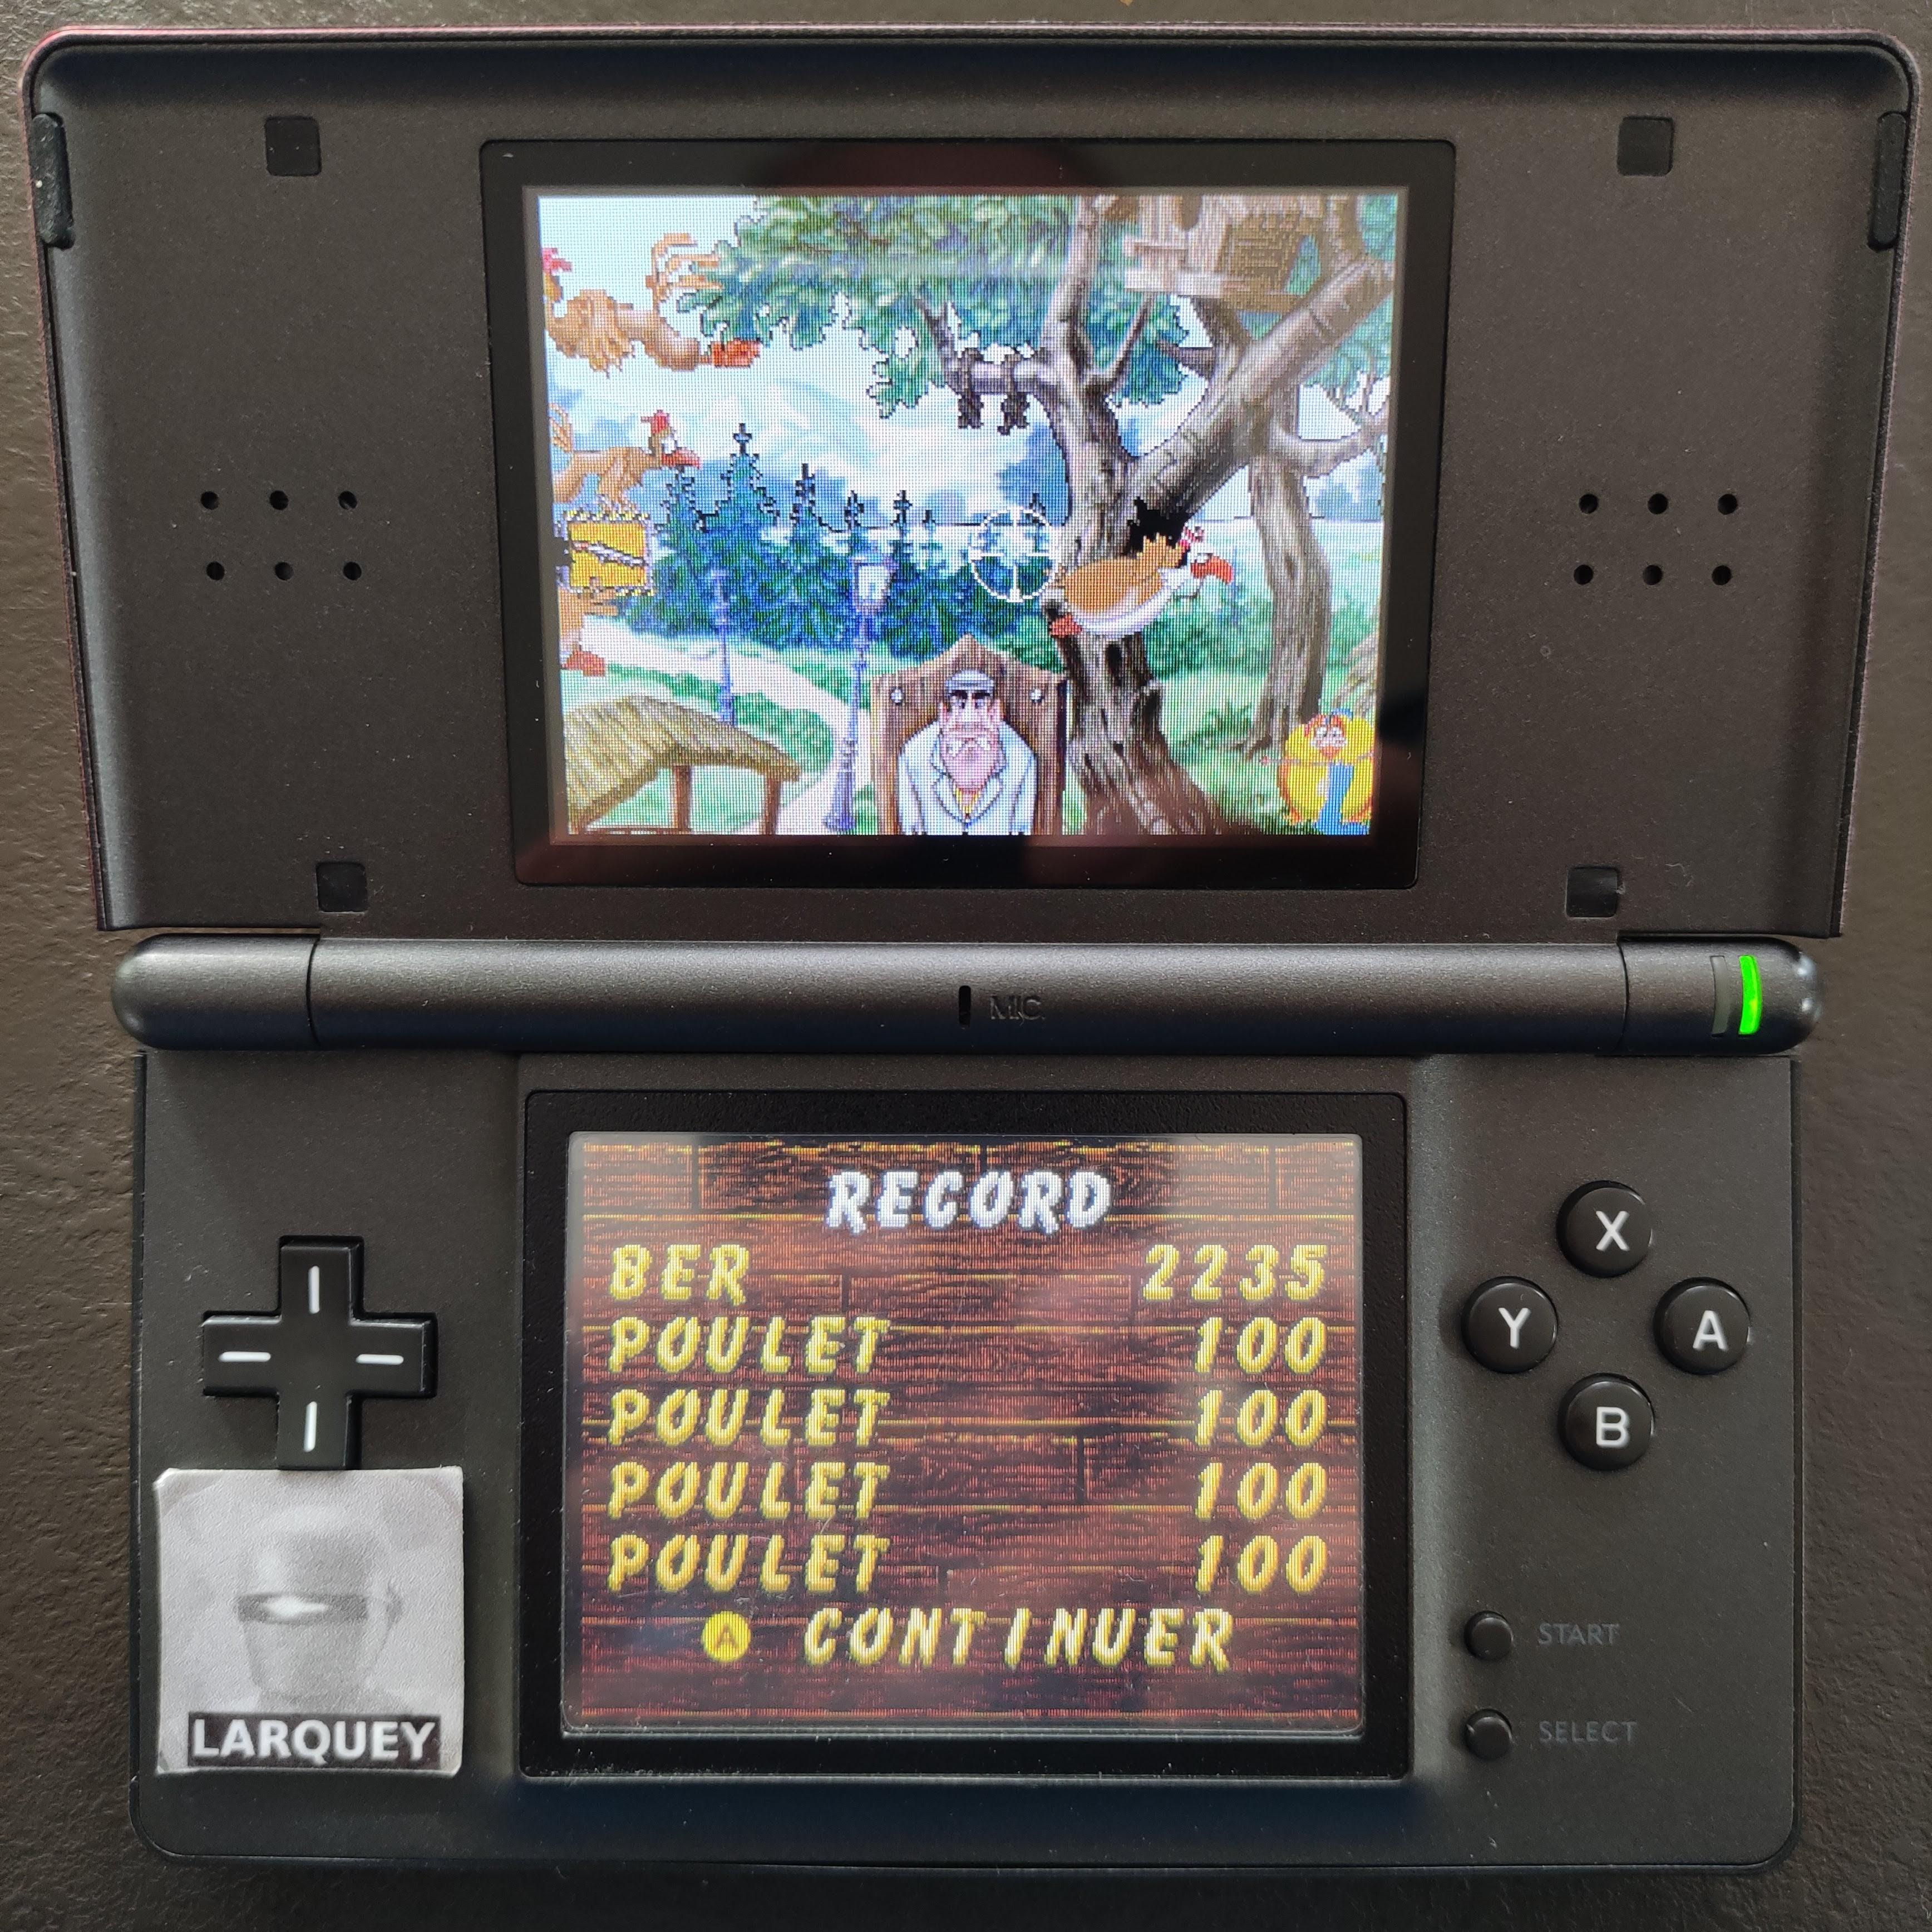 Larquey: Chicken Shoot [Arcade: Easy] (Nintendo DS) 2,235 points on 2020-09-27 03:23:47